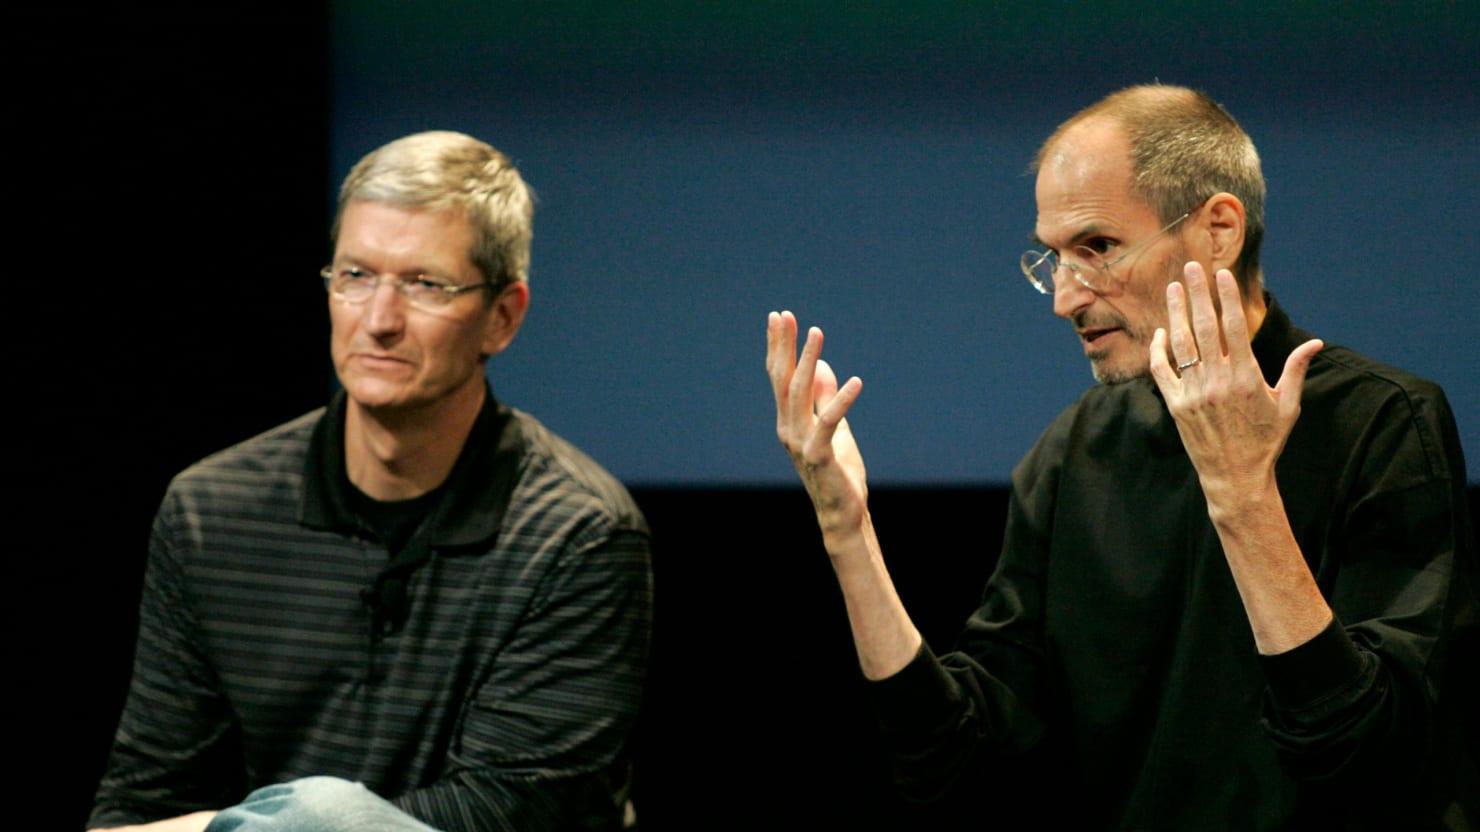 Steve Jobs Stream German